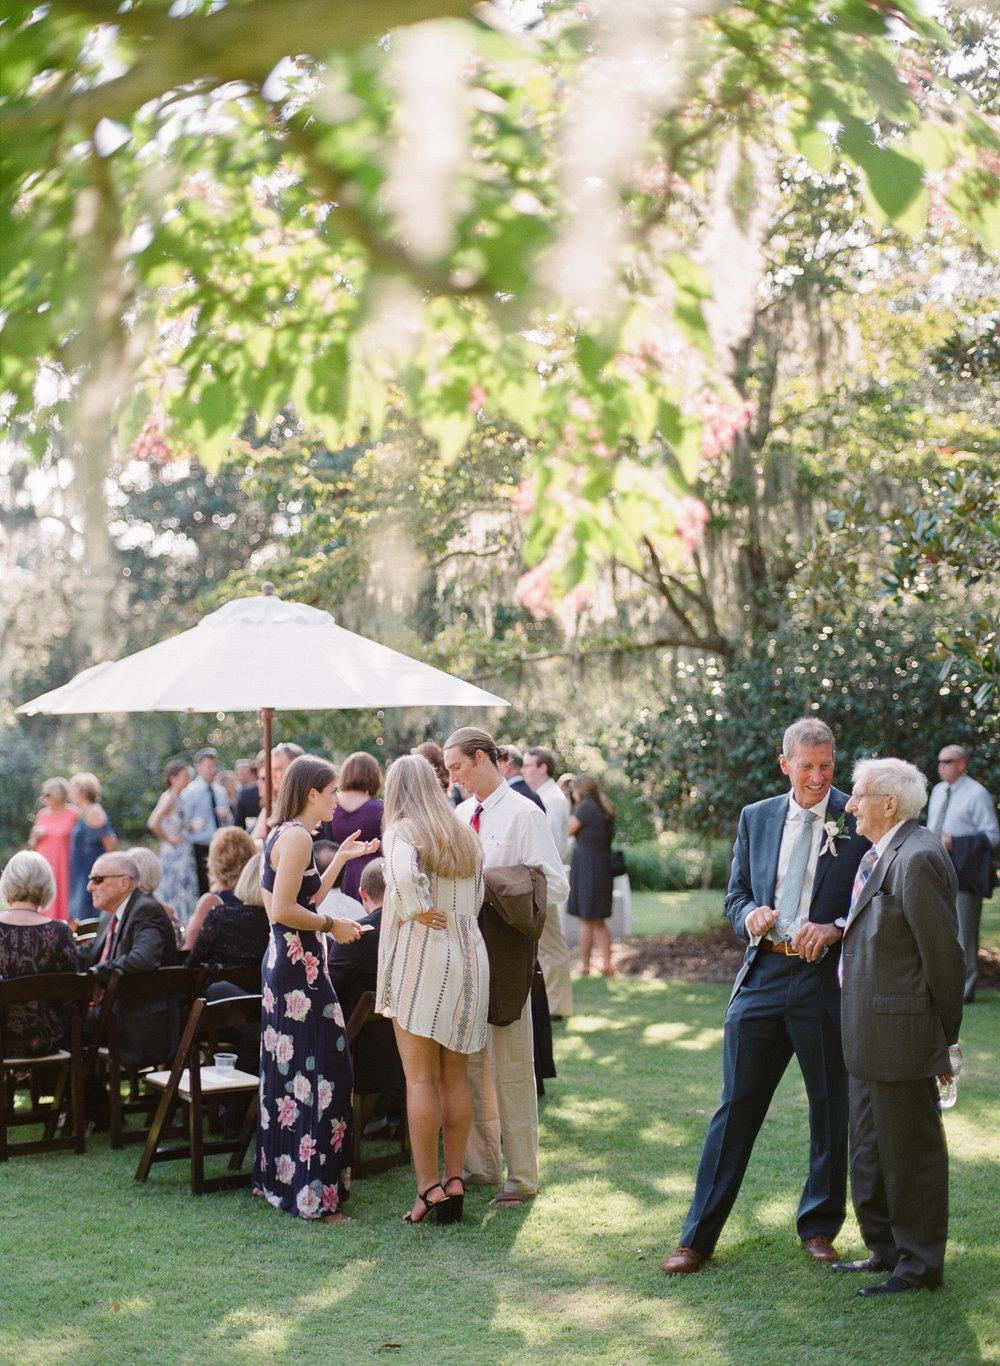 Airlie-Gardens-Wedding-34.jpg